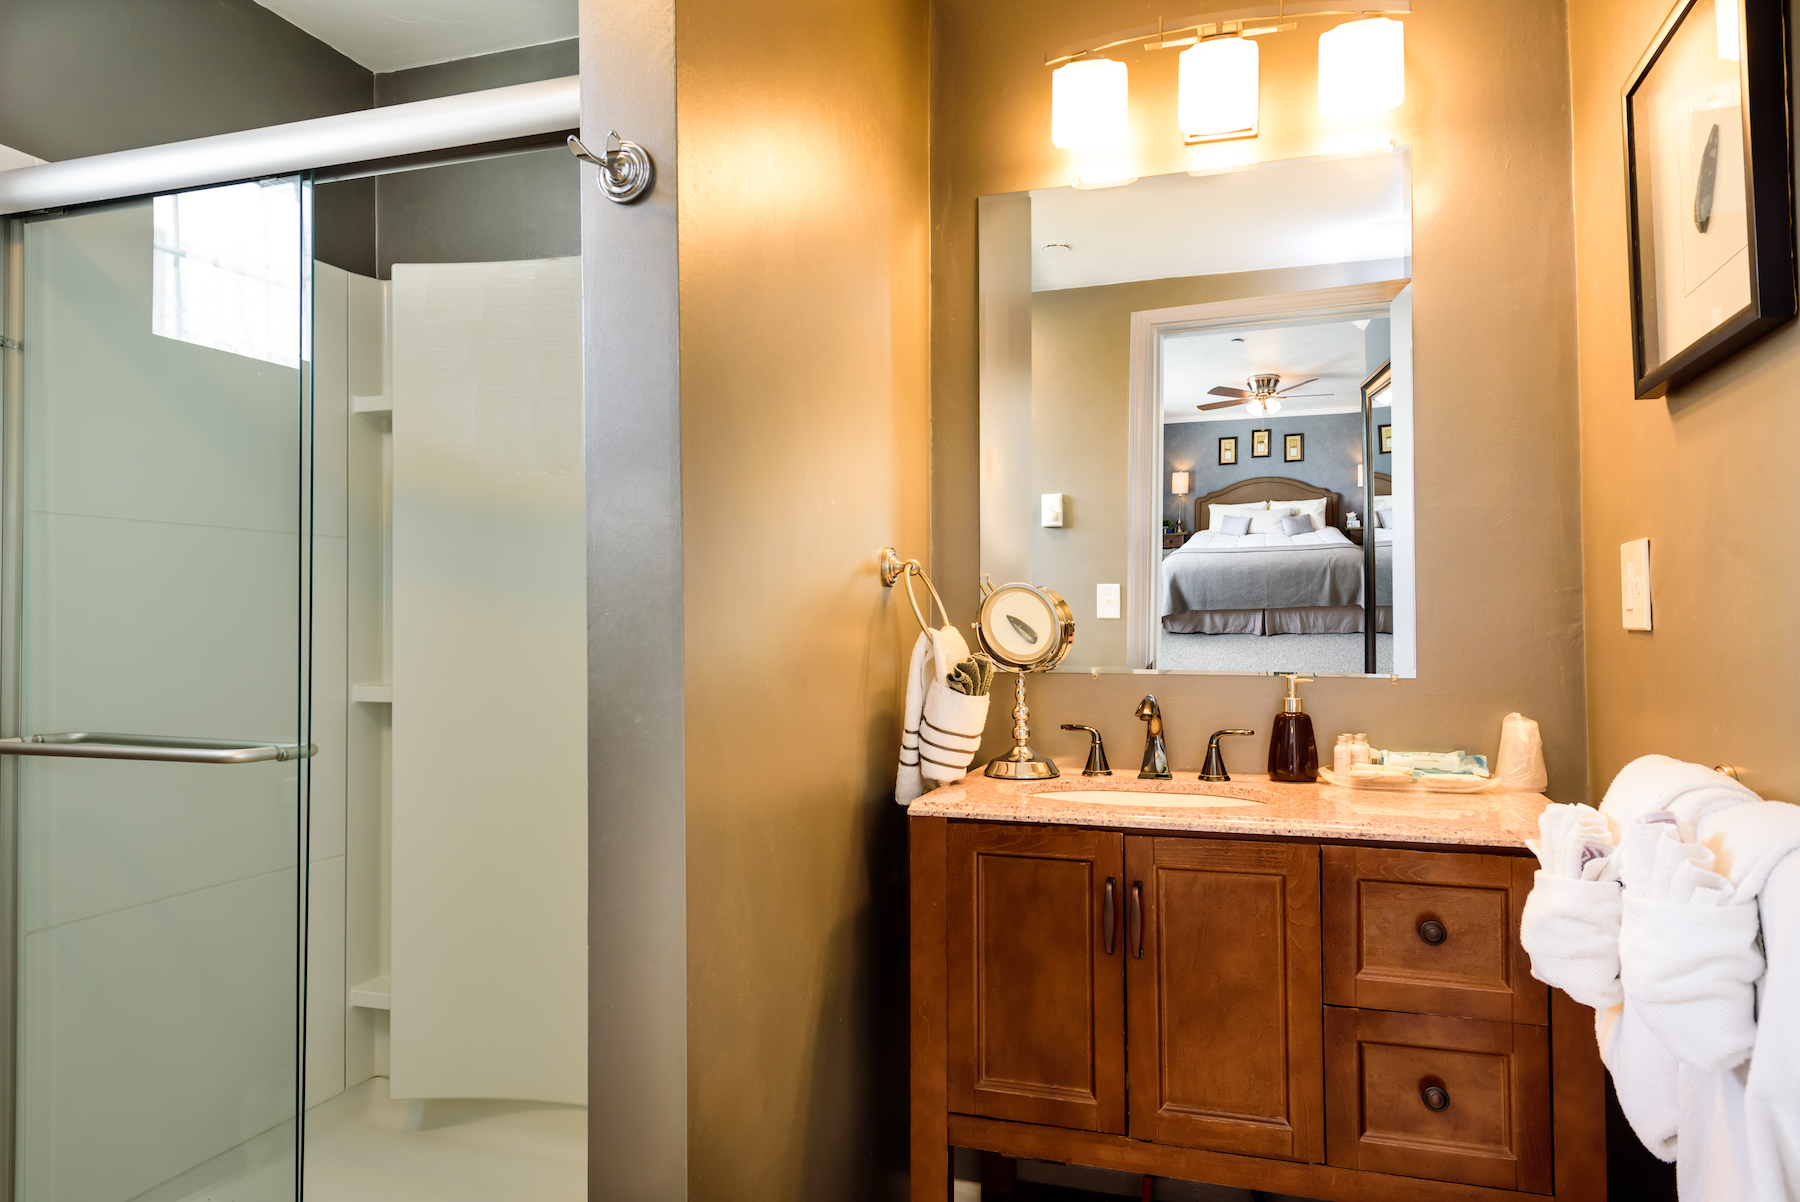 Inn-Room-12-and-Bathroom-20180402-038-Edit-1